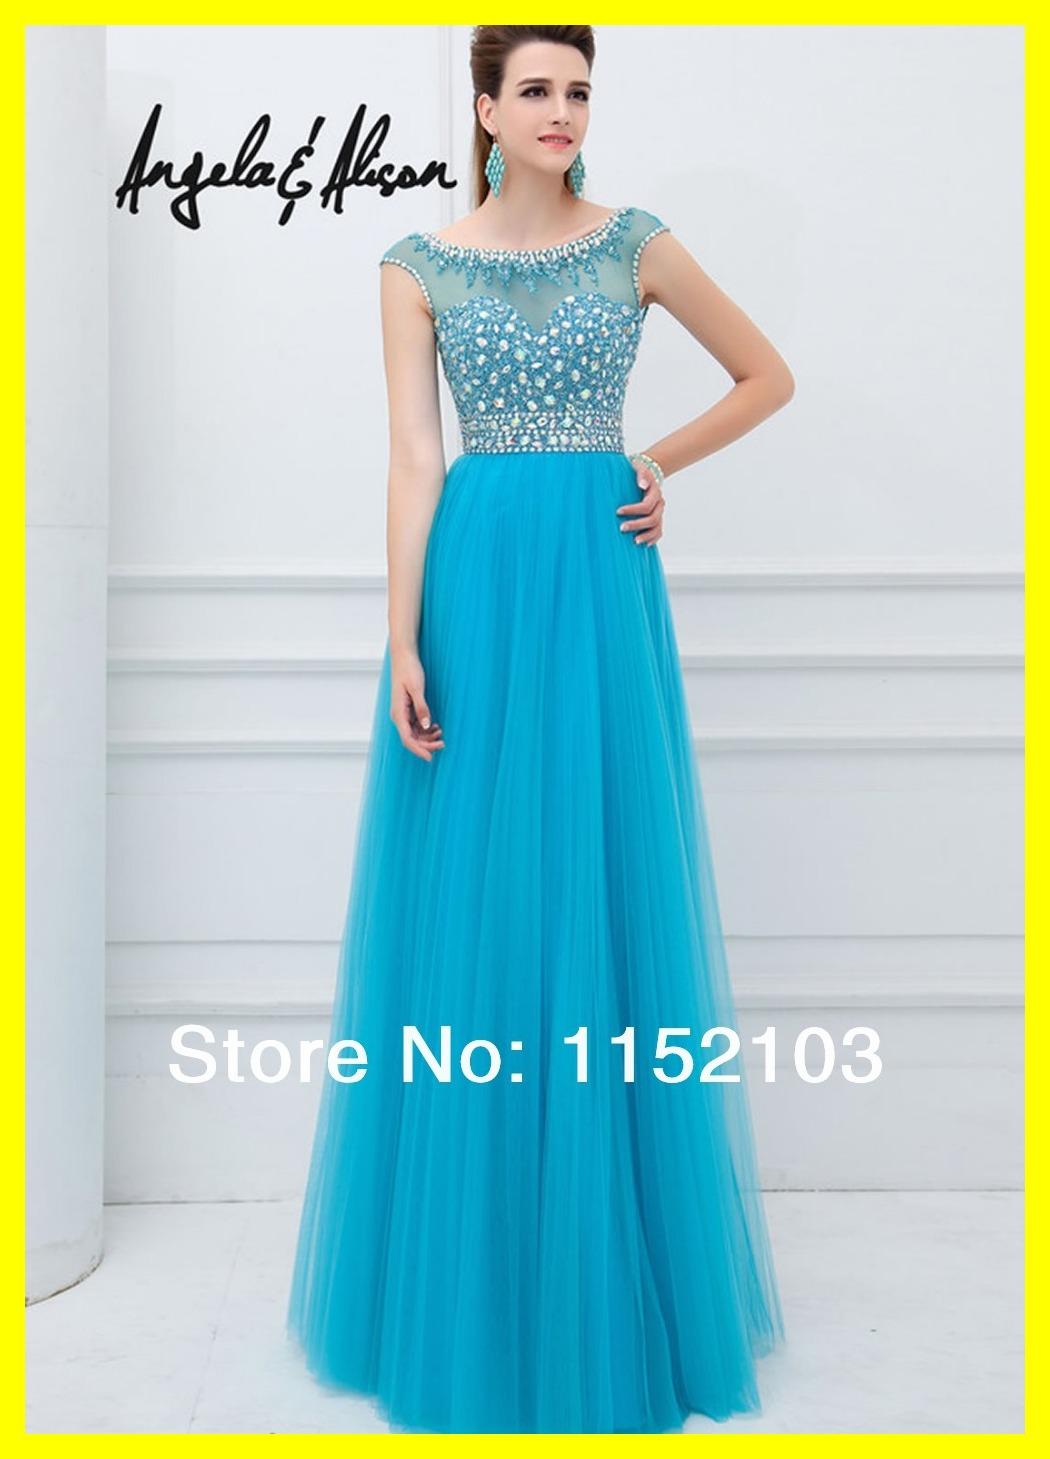 Designer Evening Dresses Online - Plus Size Tops